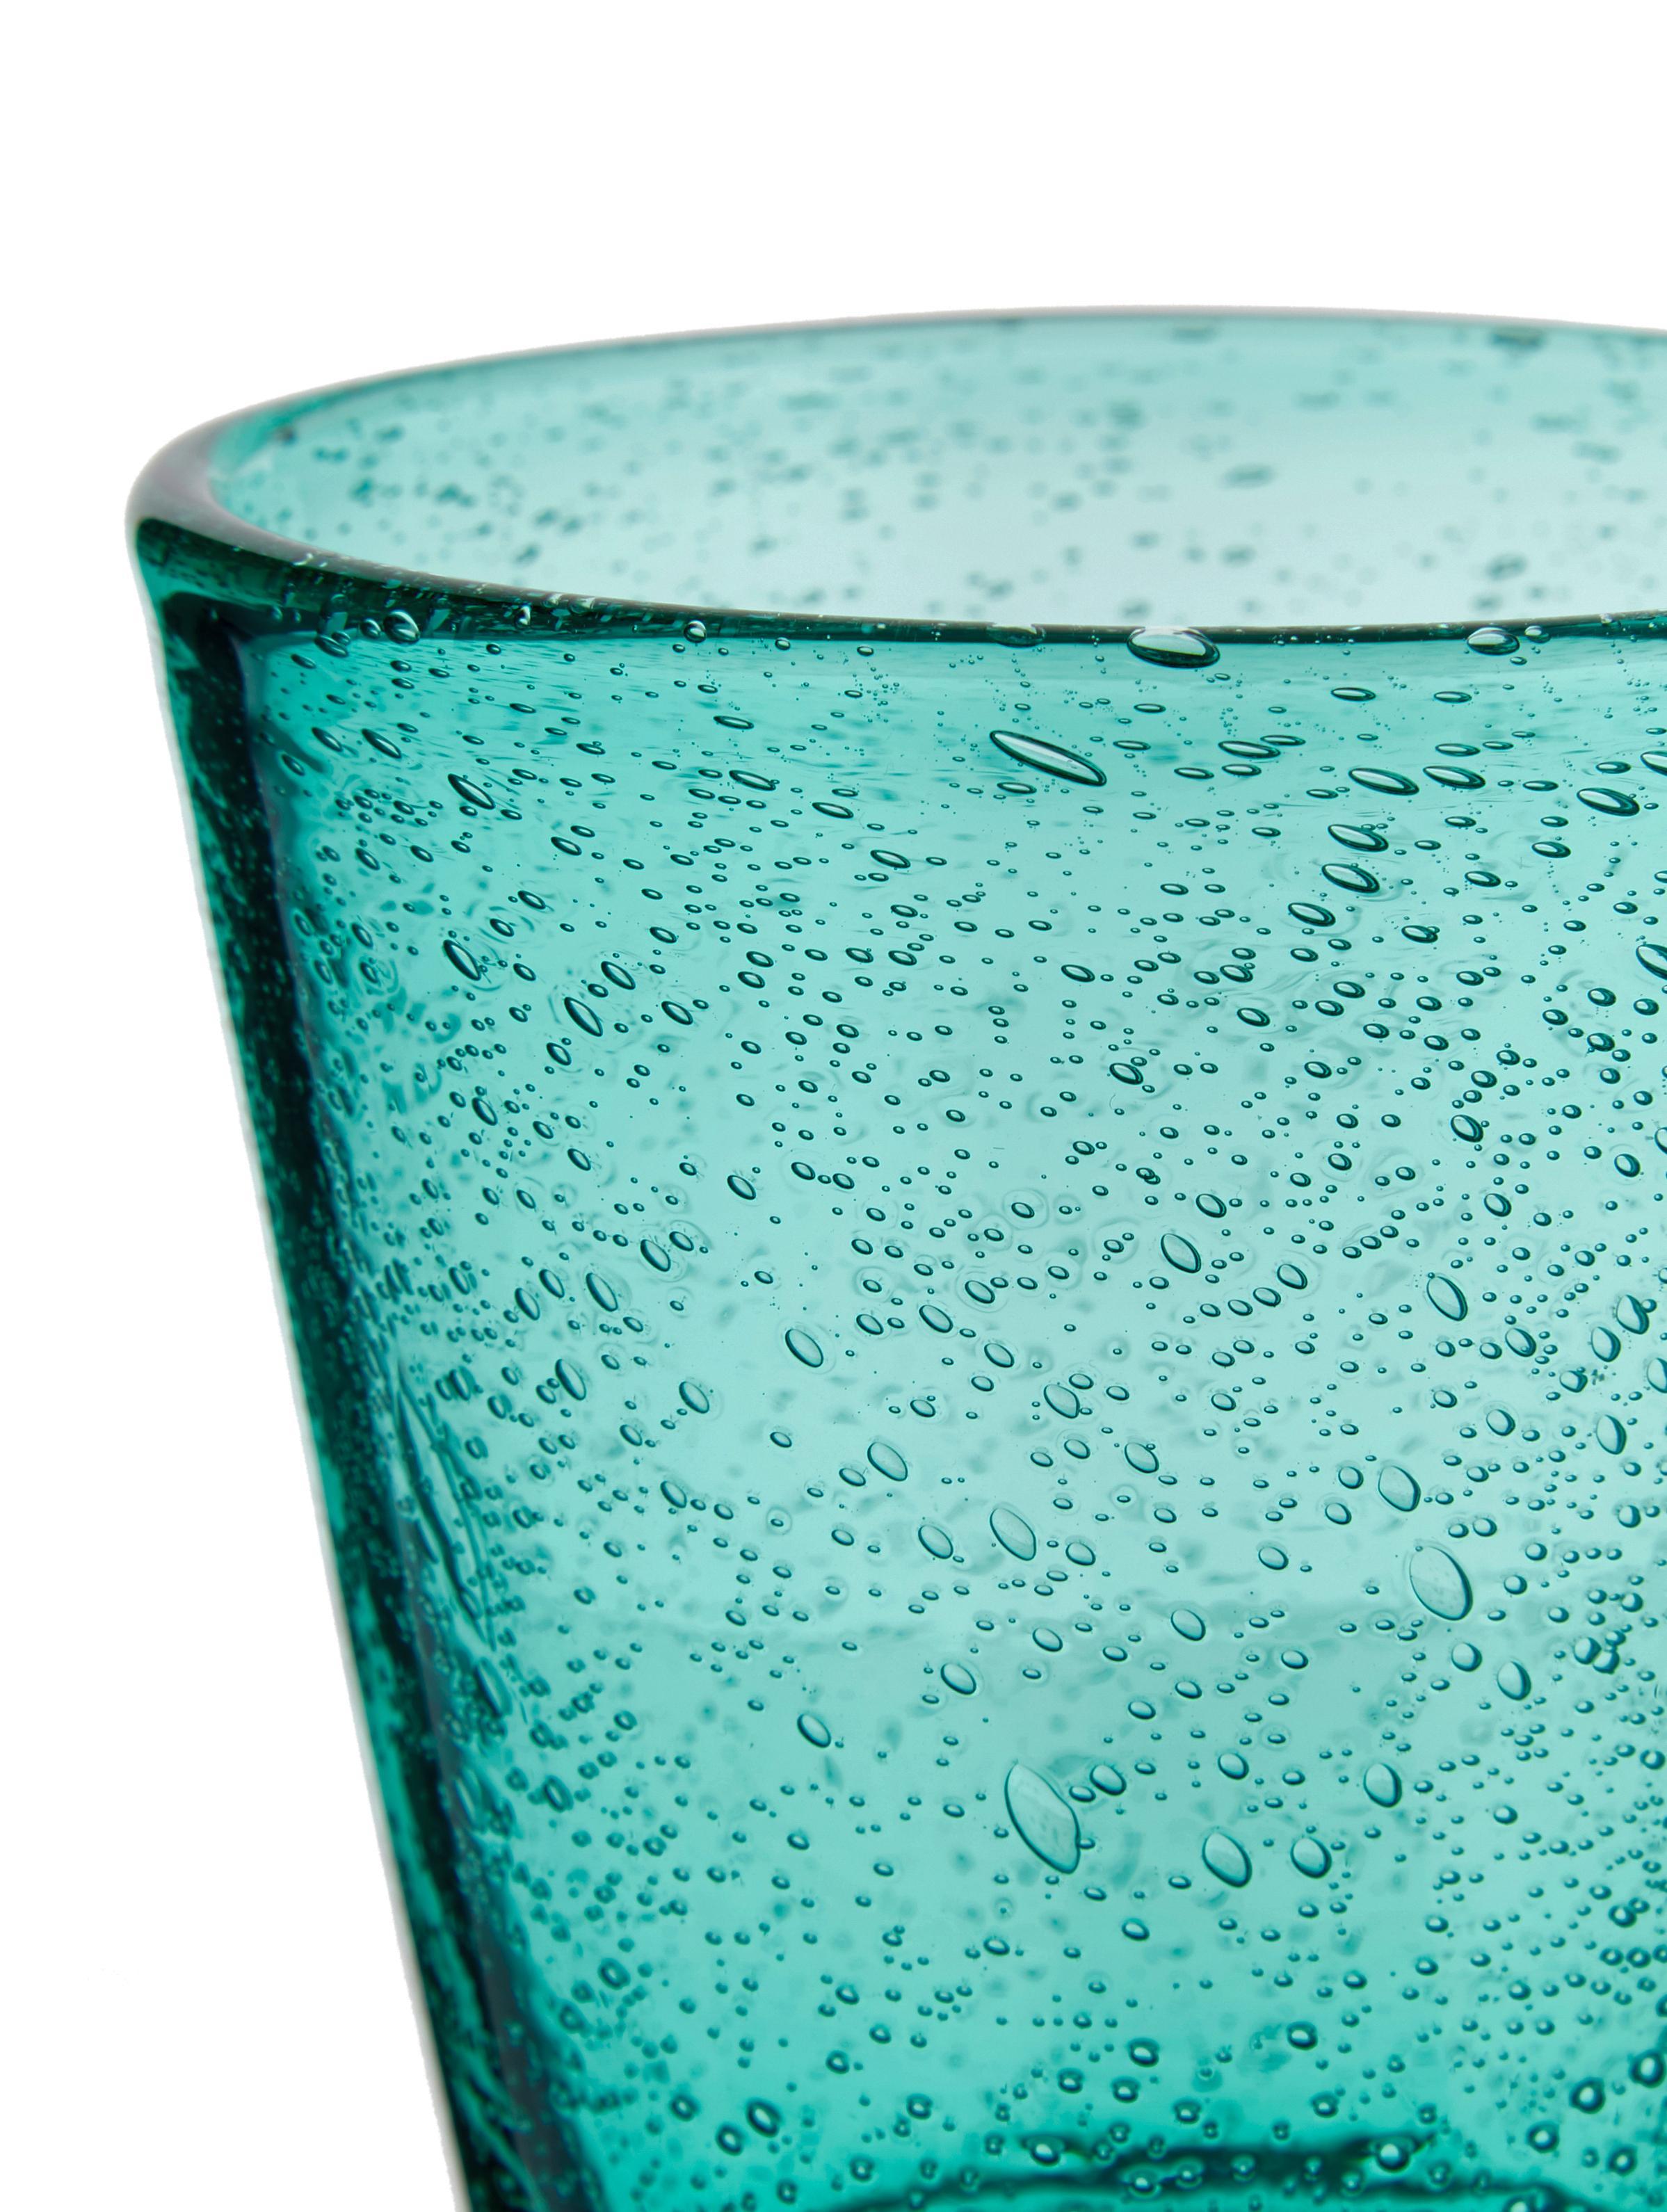 Set 6 bicchieri acqua Baita, Vetro, Tonalità blu e grigie trasparente, Ø 9 x Alt. 10 cm